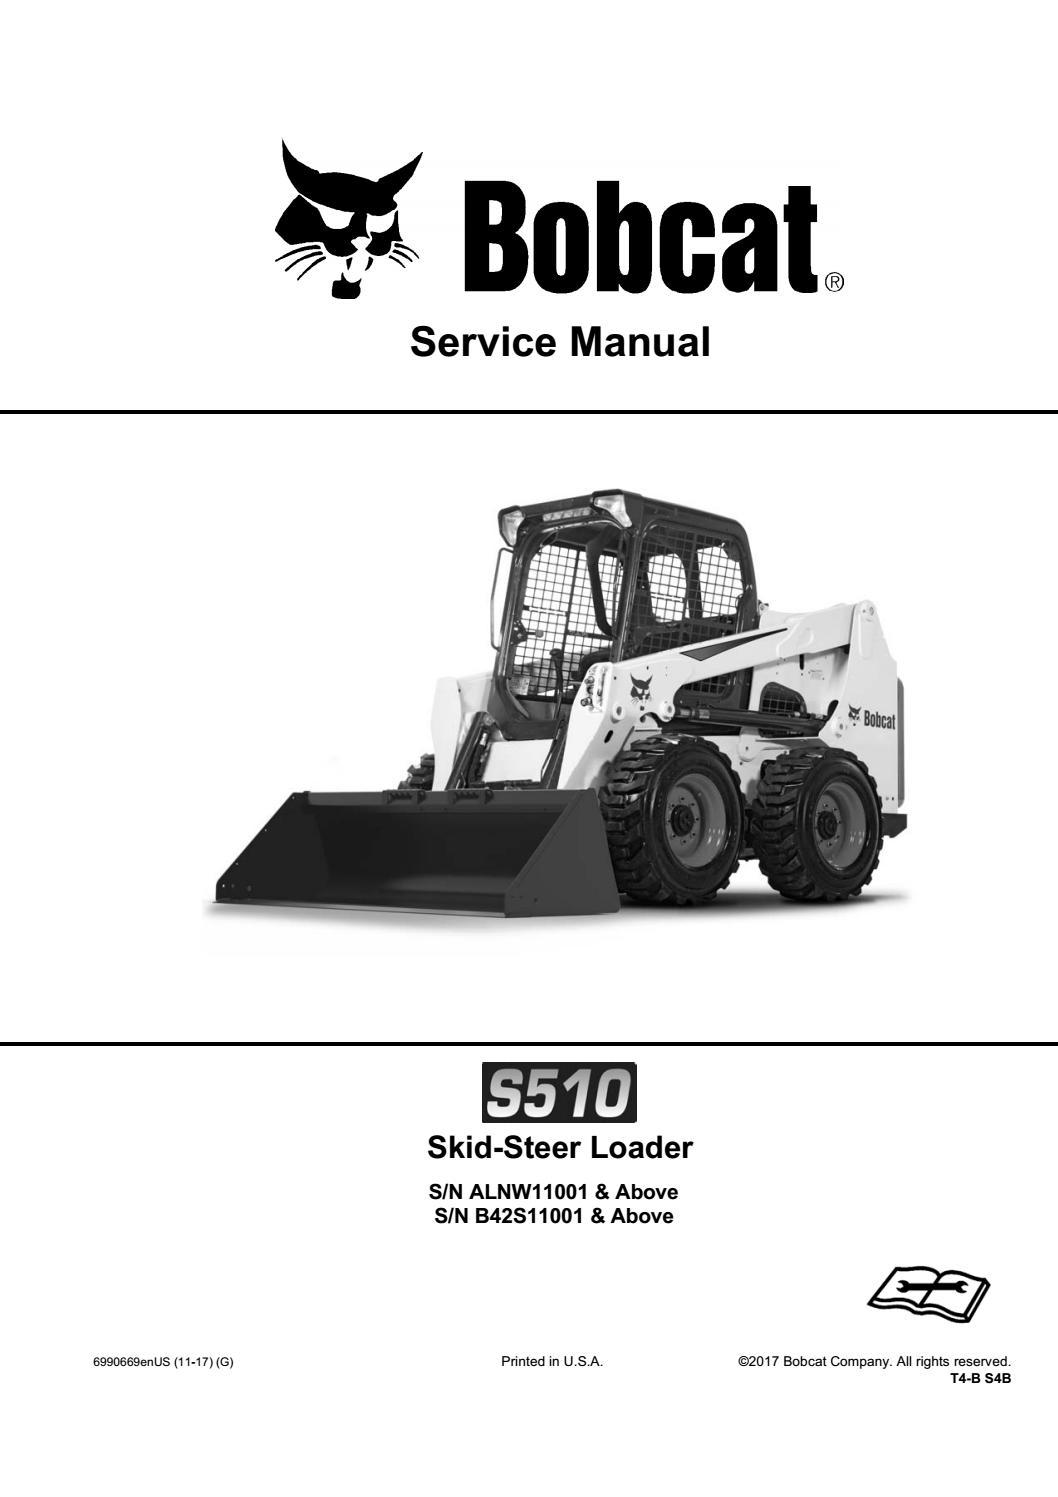 Bobcat S510 Skid Steer Loader Service Repair Manual Sn B42s11001 And Above By Shuianxu9 Issuu